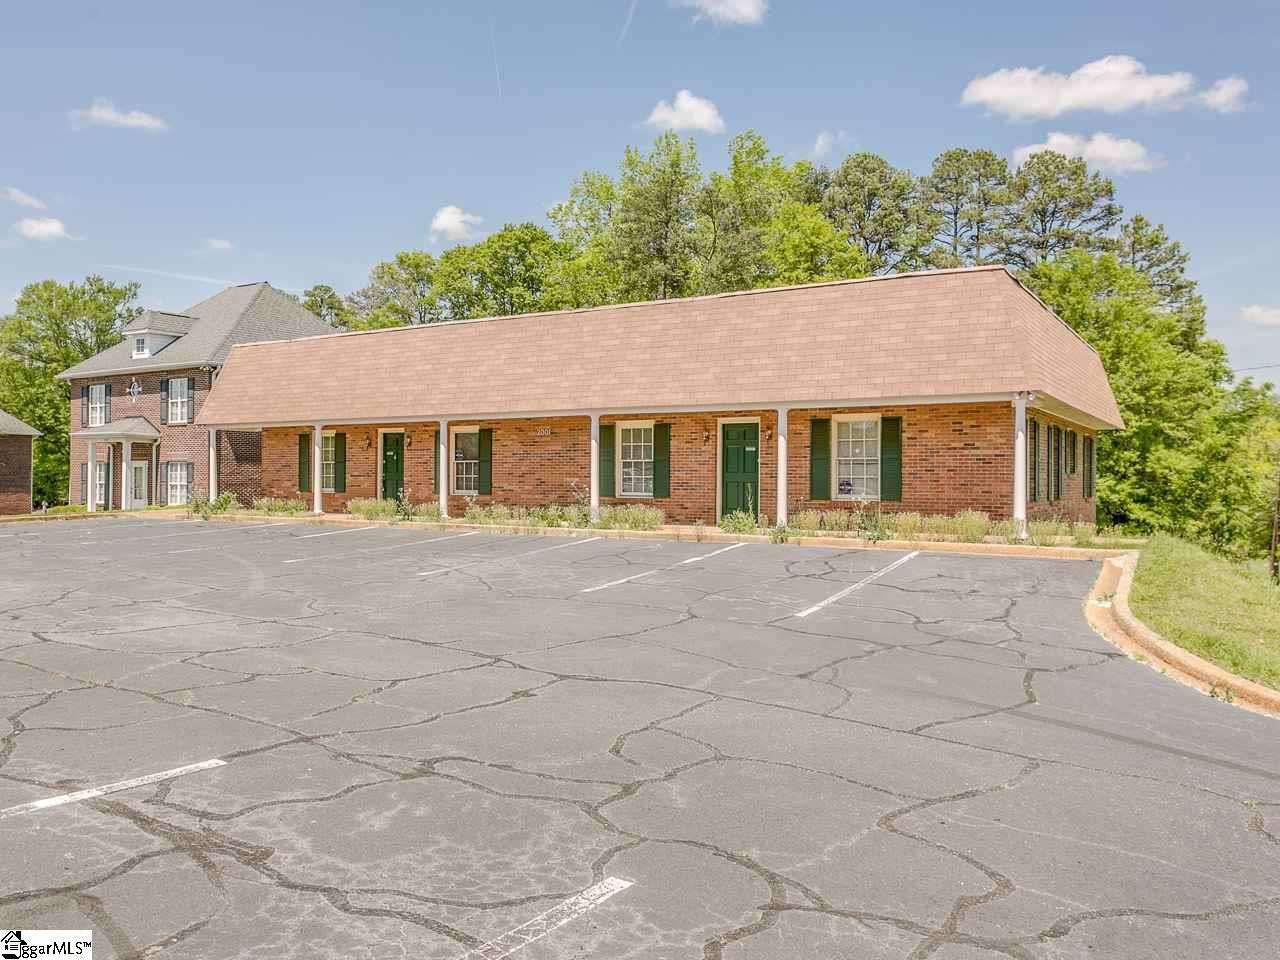 2001 S Pine, Spartanburg, SC 29302